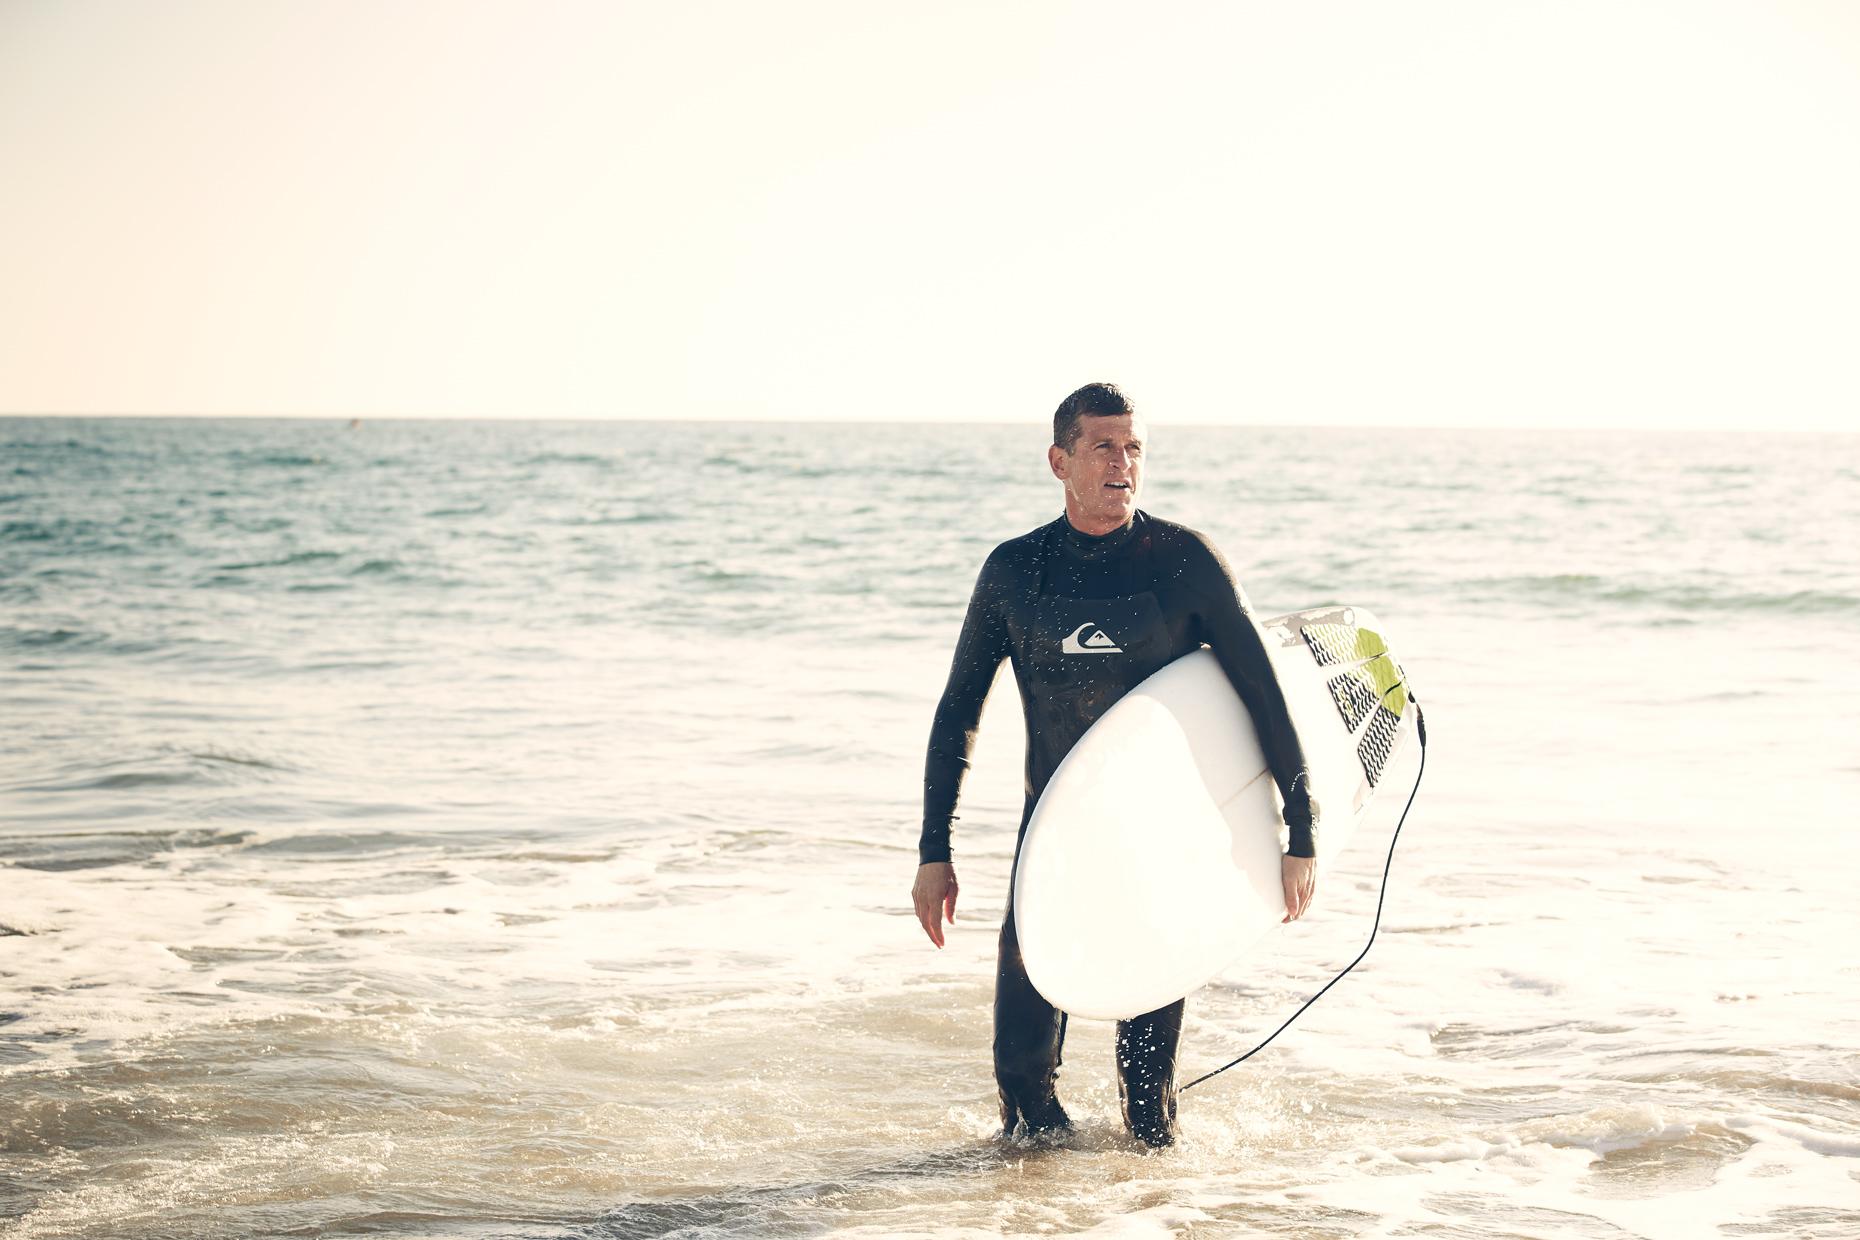 Lifestyle photography Derek Israelsen Surfer Beach